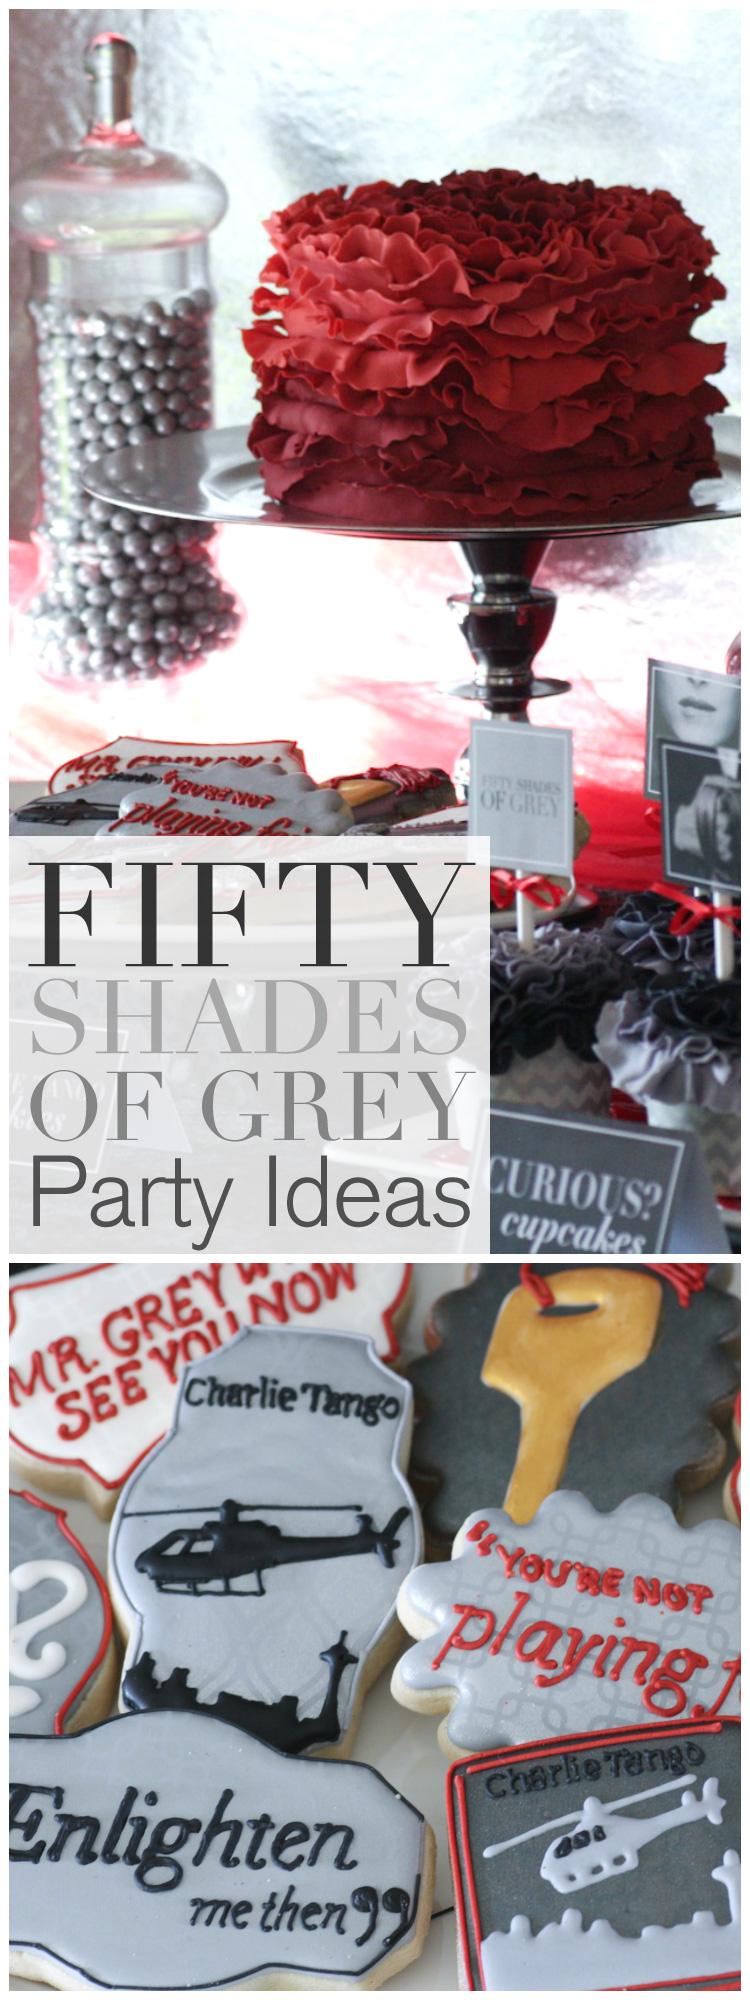 why girls like 50 shades of grey